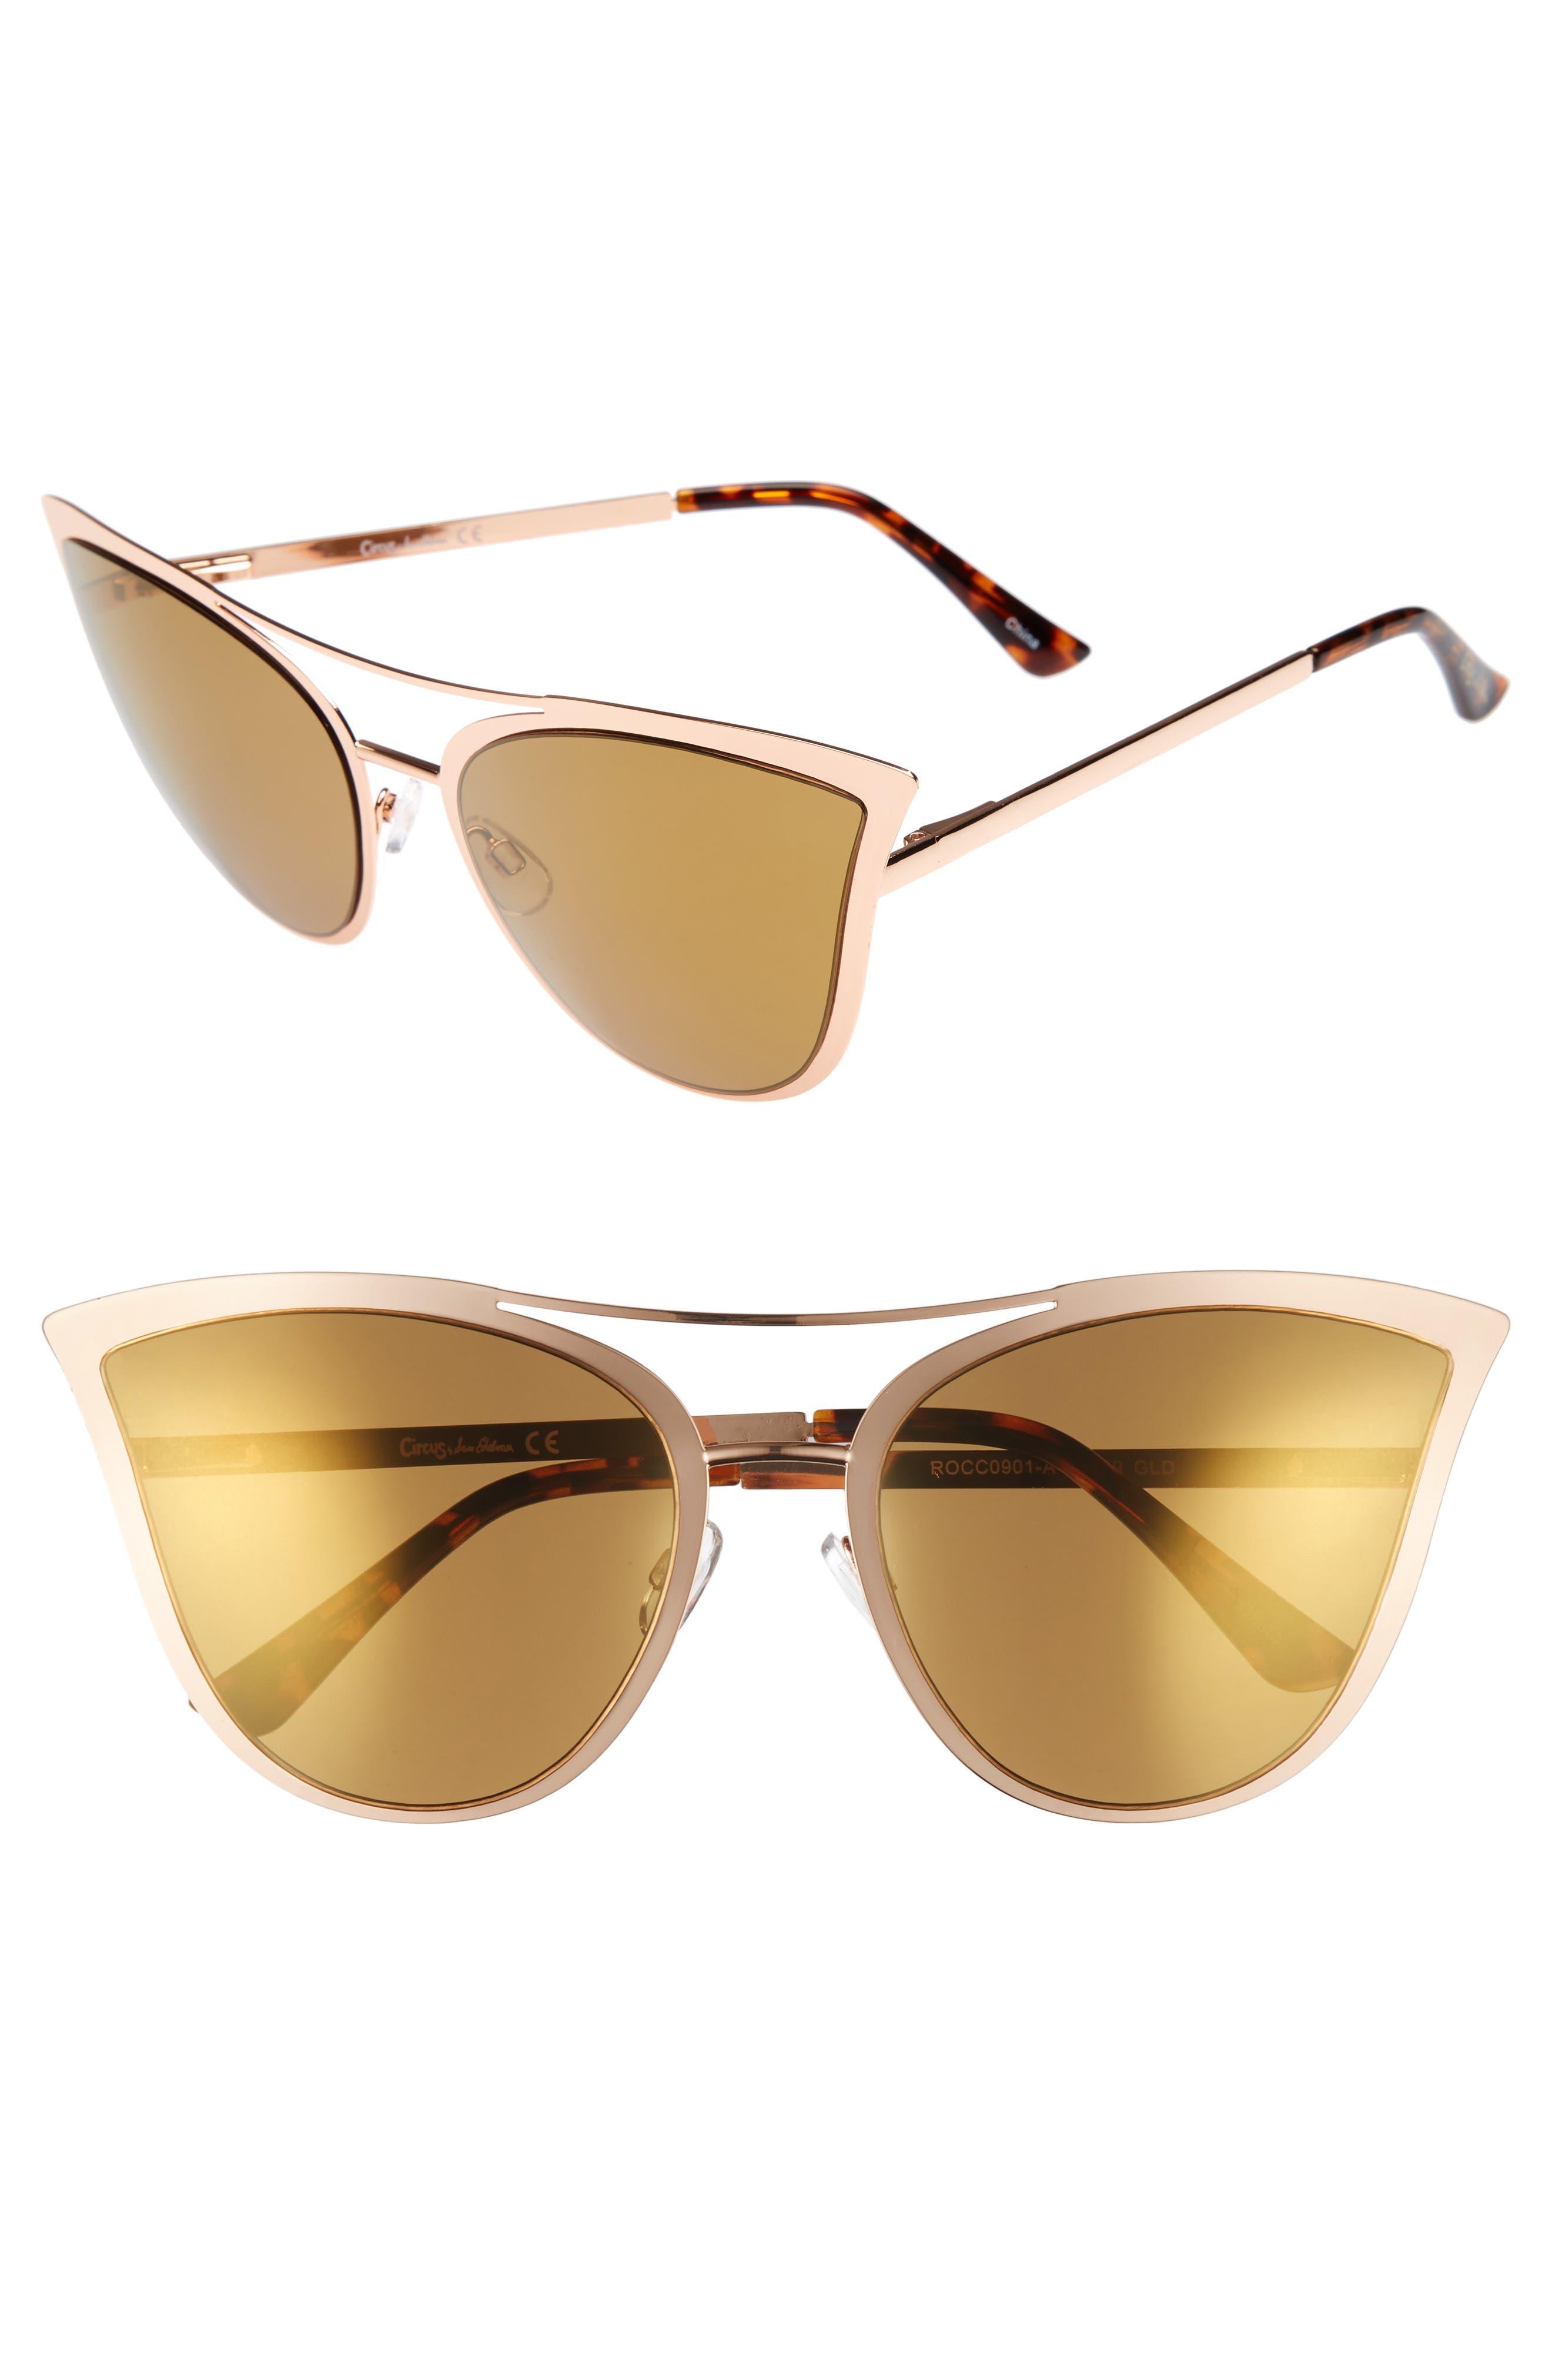 61mm Metal Cat Eye Sunglasses,                             Main thumbnail 1, color,                             Gold